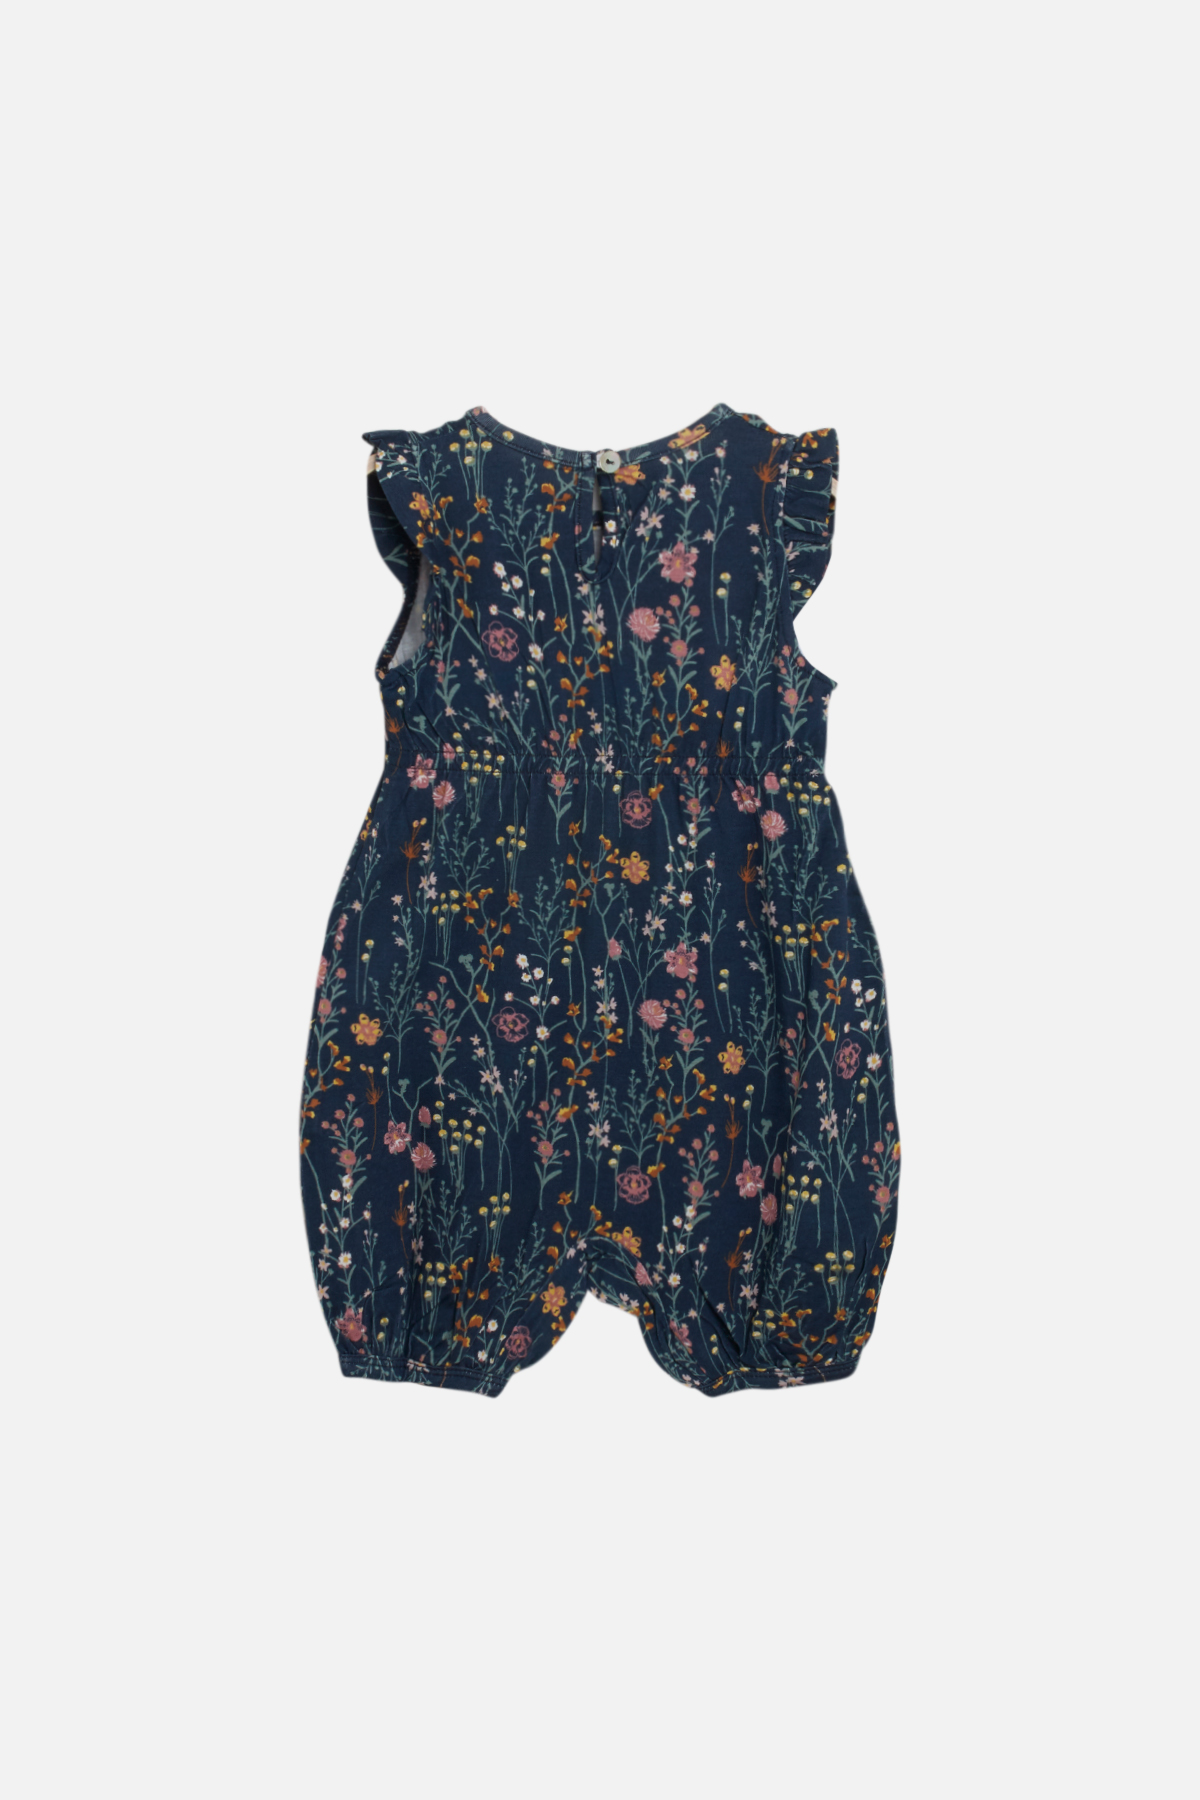 Kids Bamboo - Musling - Nightwear